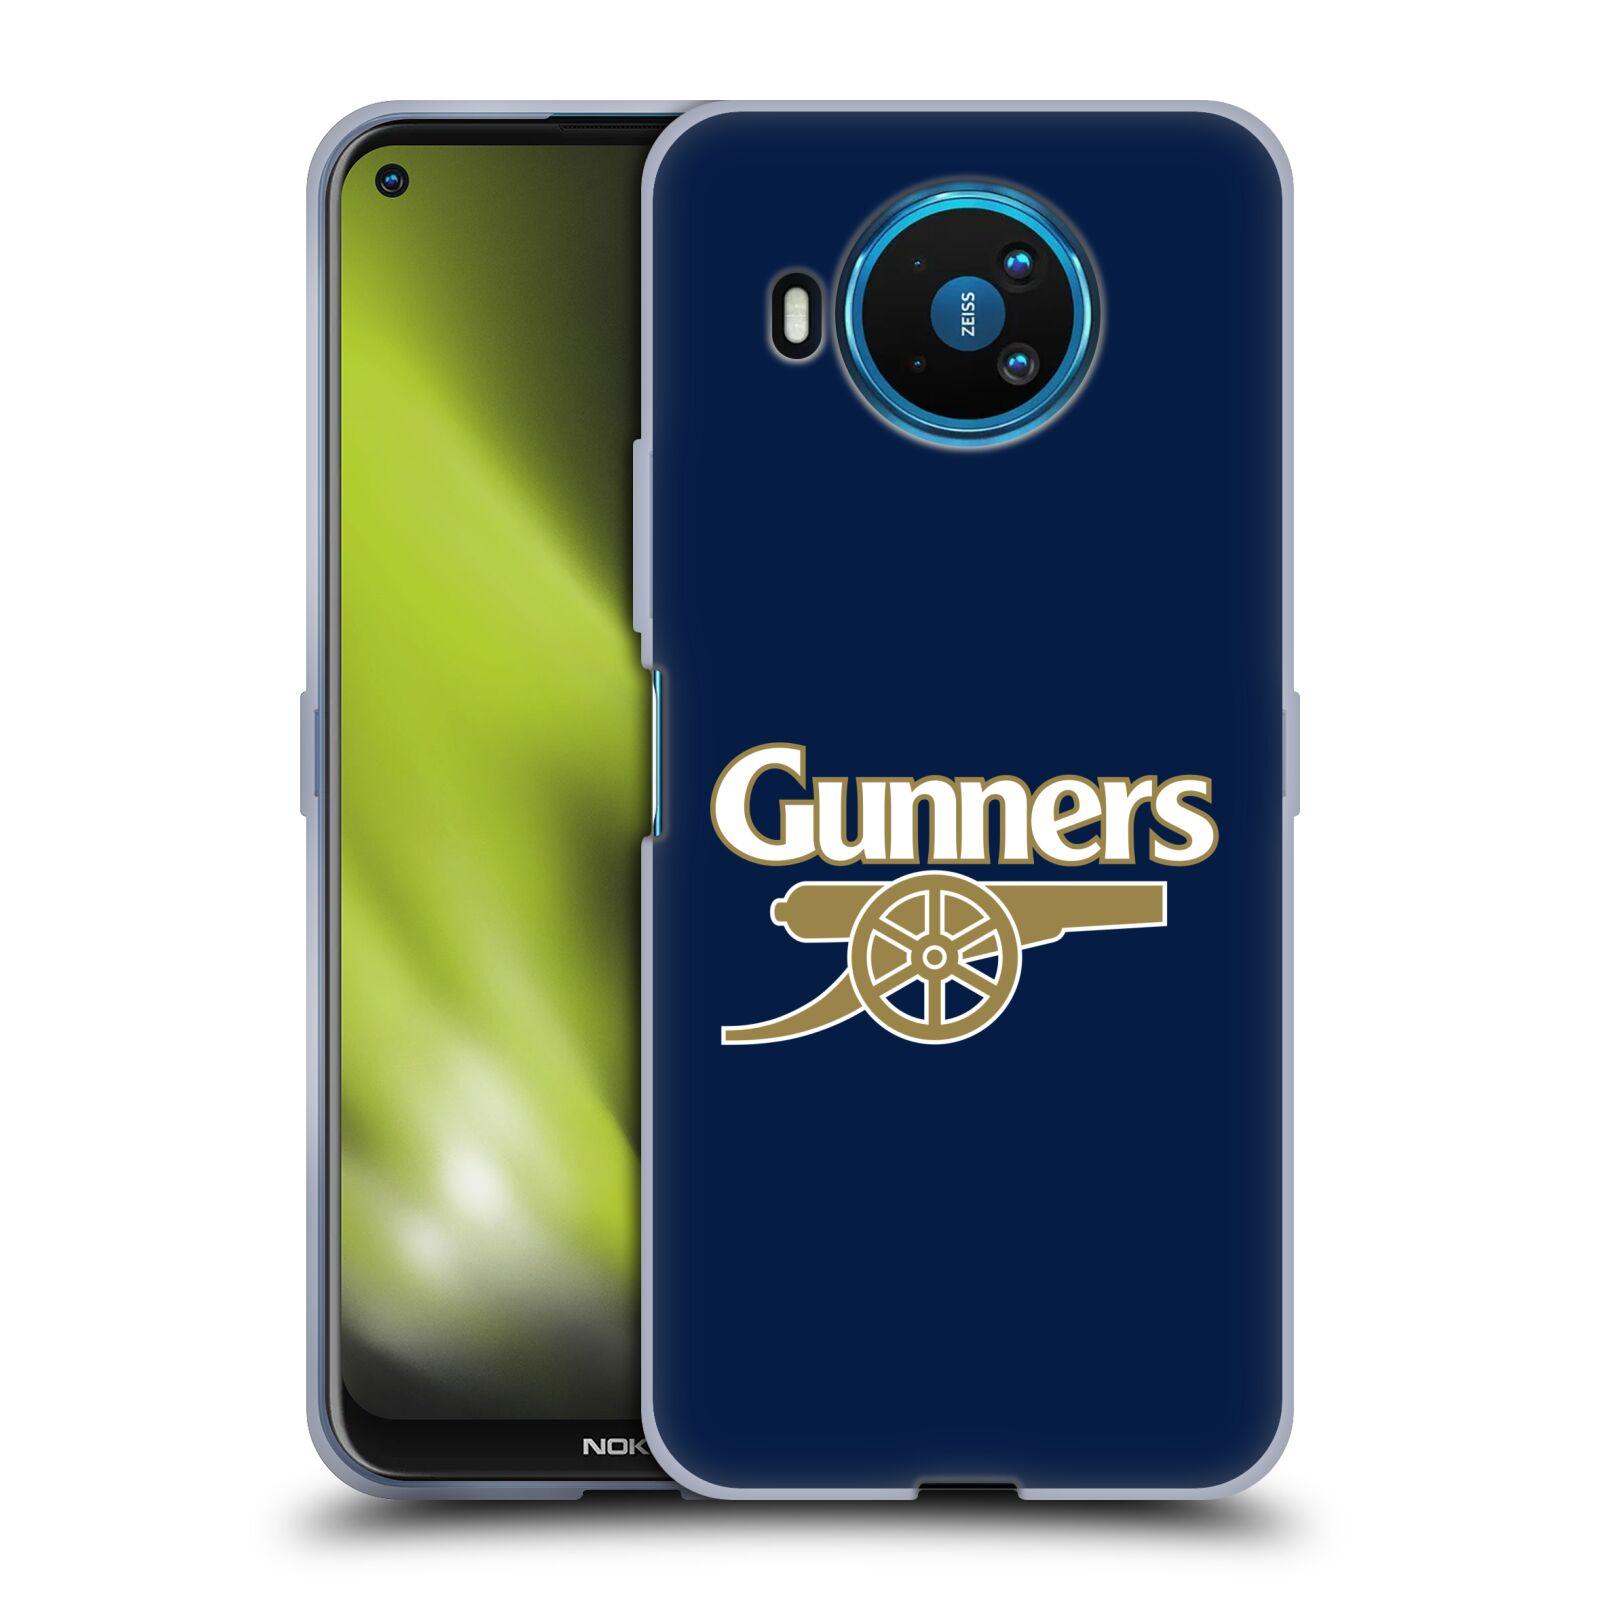 Silikonové pouzdro na mobil Nokia 8.3 5G - Head Case - Arsenal FC - Gunners